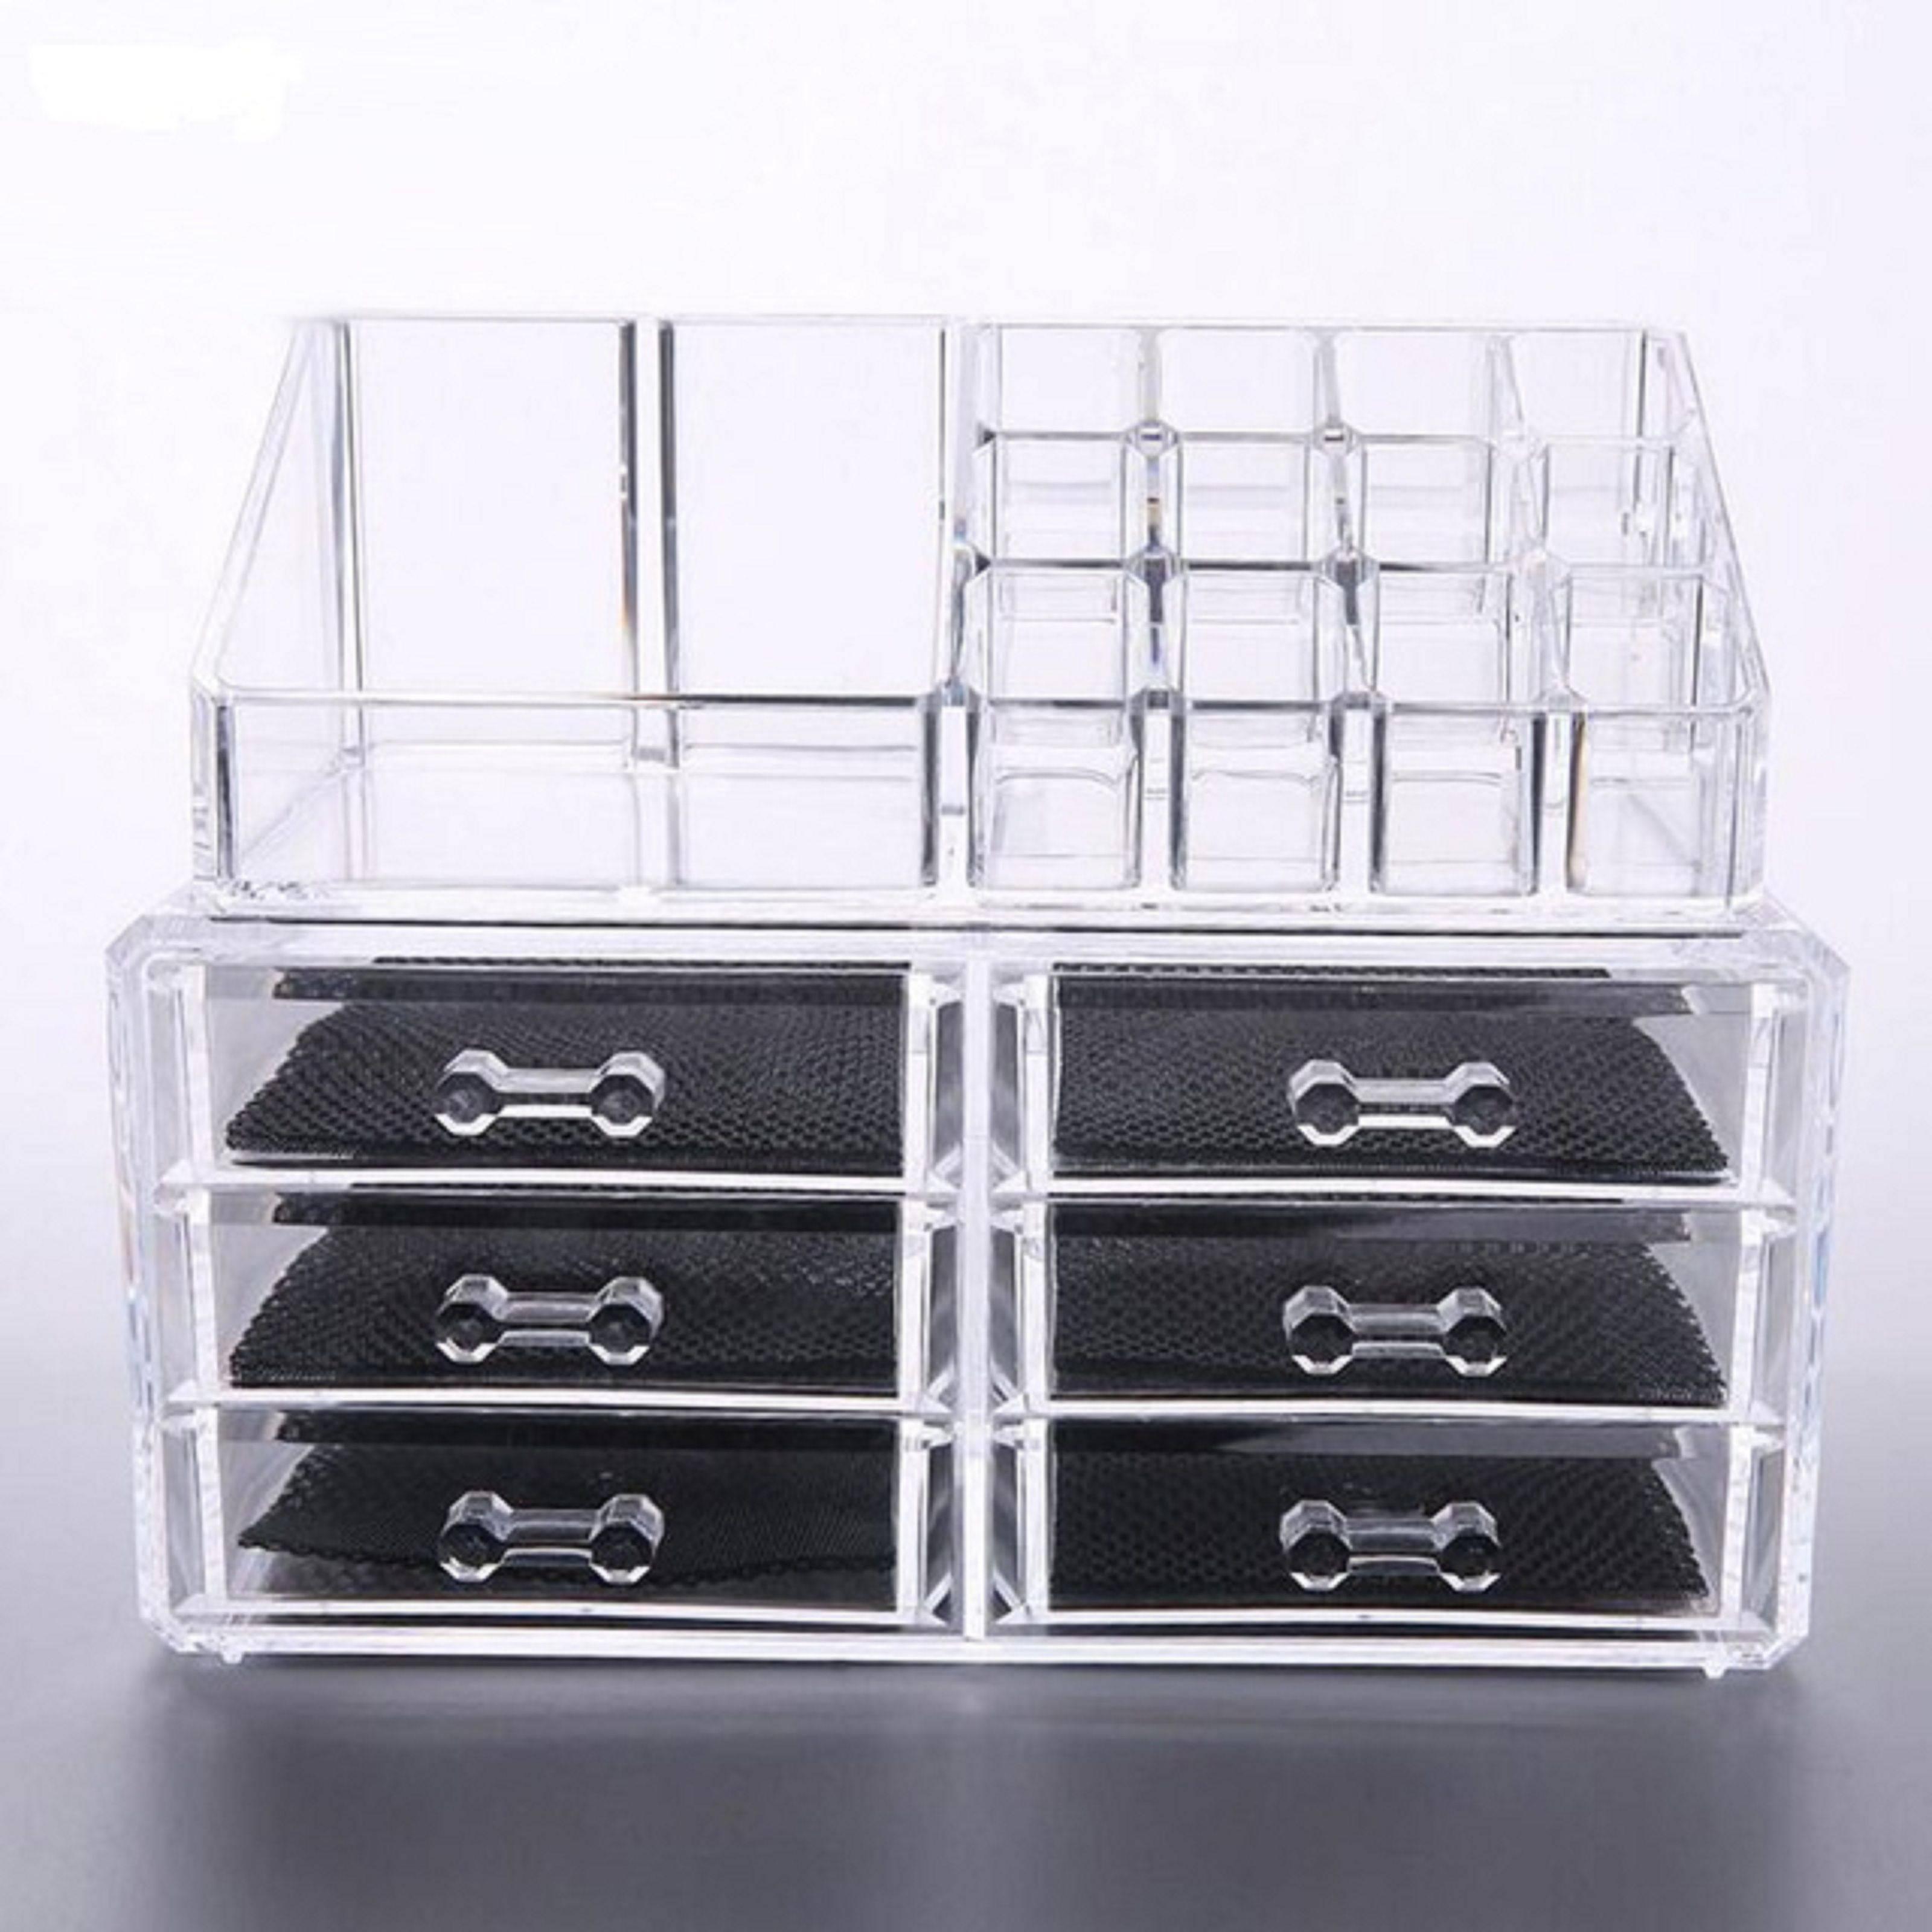 AVMART Cosmetic Organizer Makeup Storage SDL 1